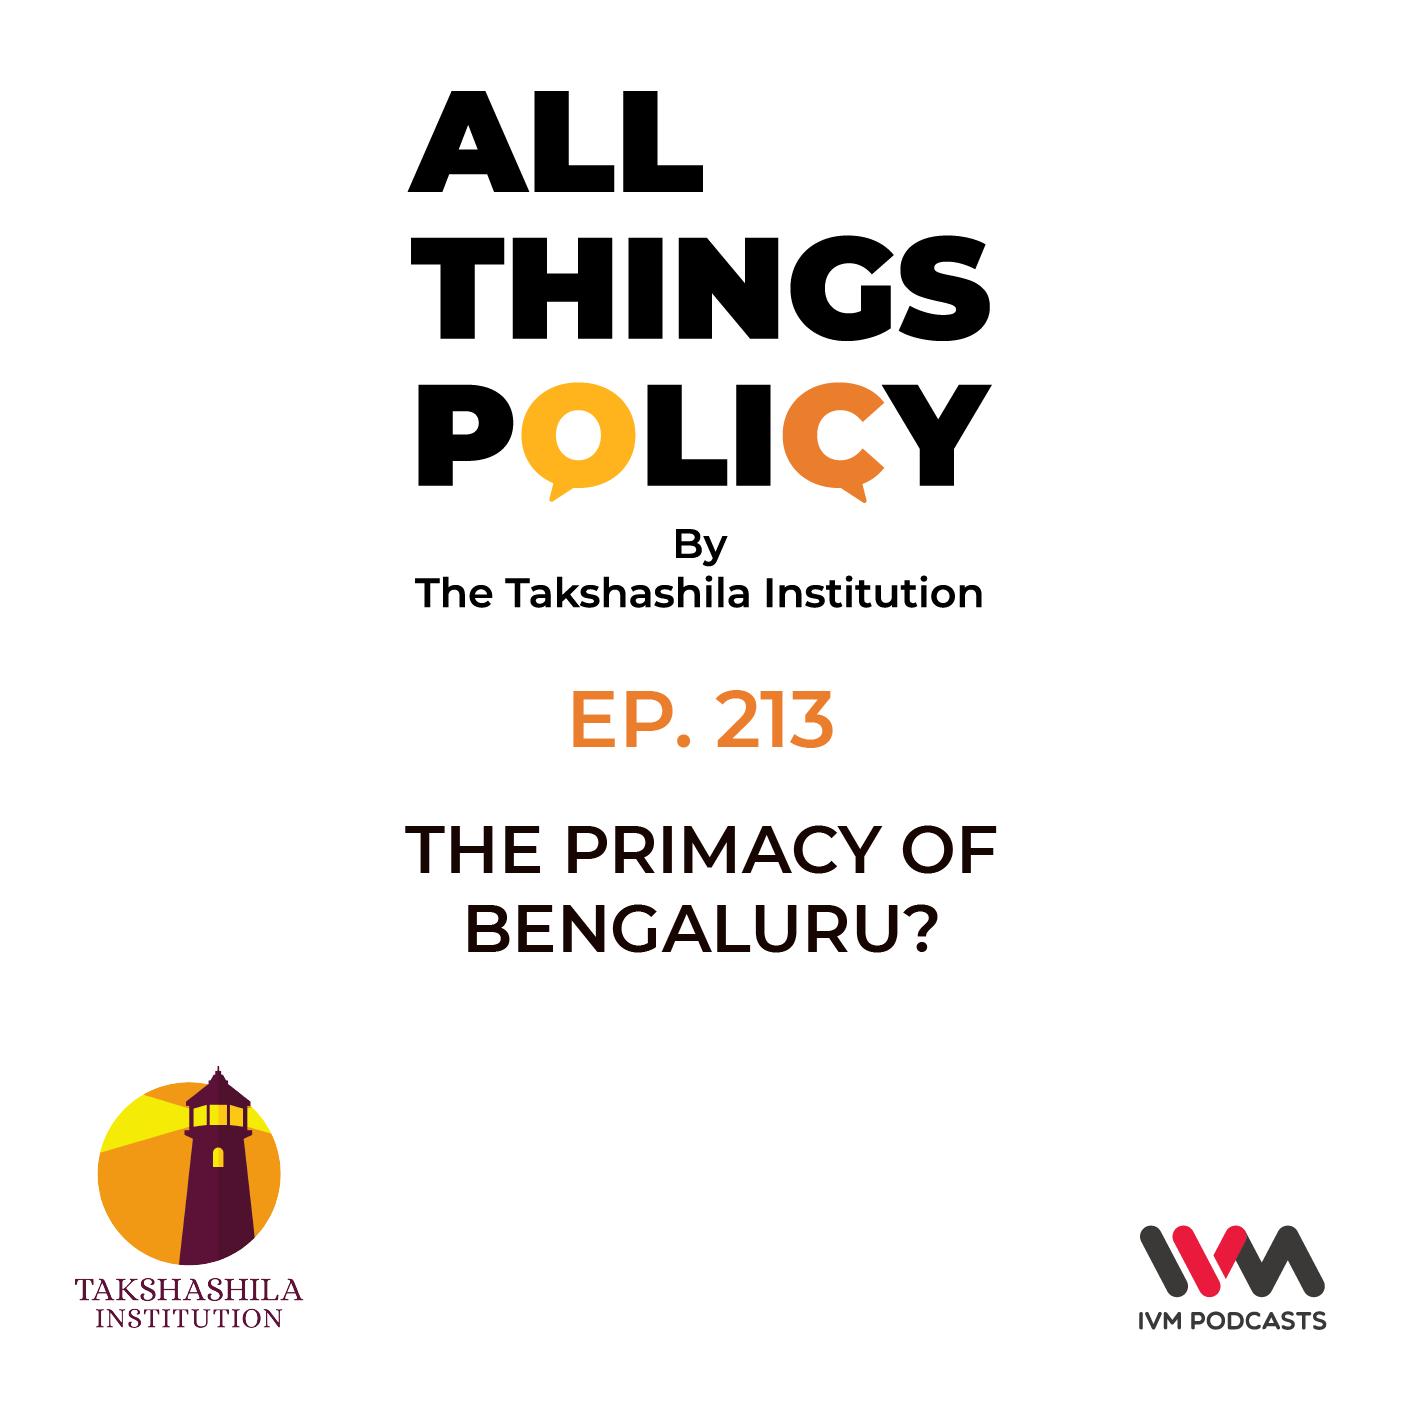 Ep. 213: The Primacy of Bengaluru?